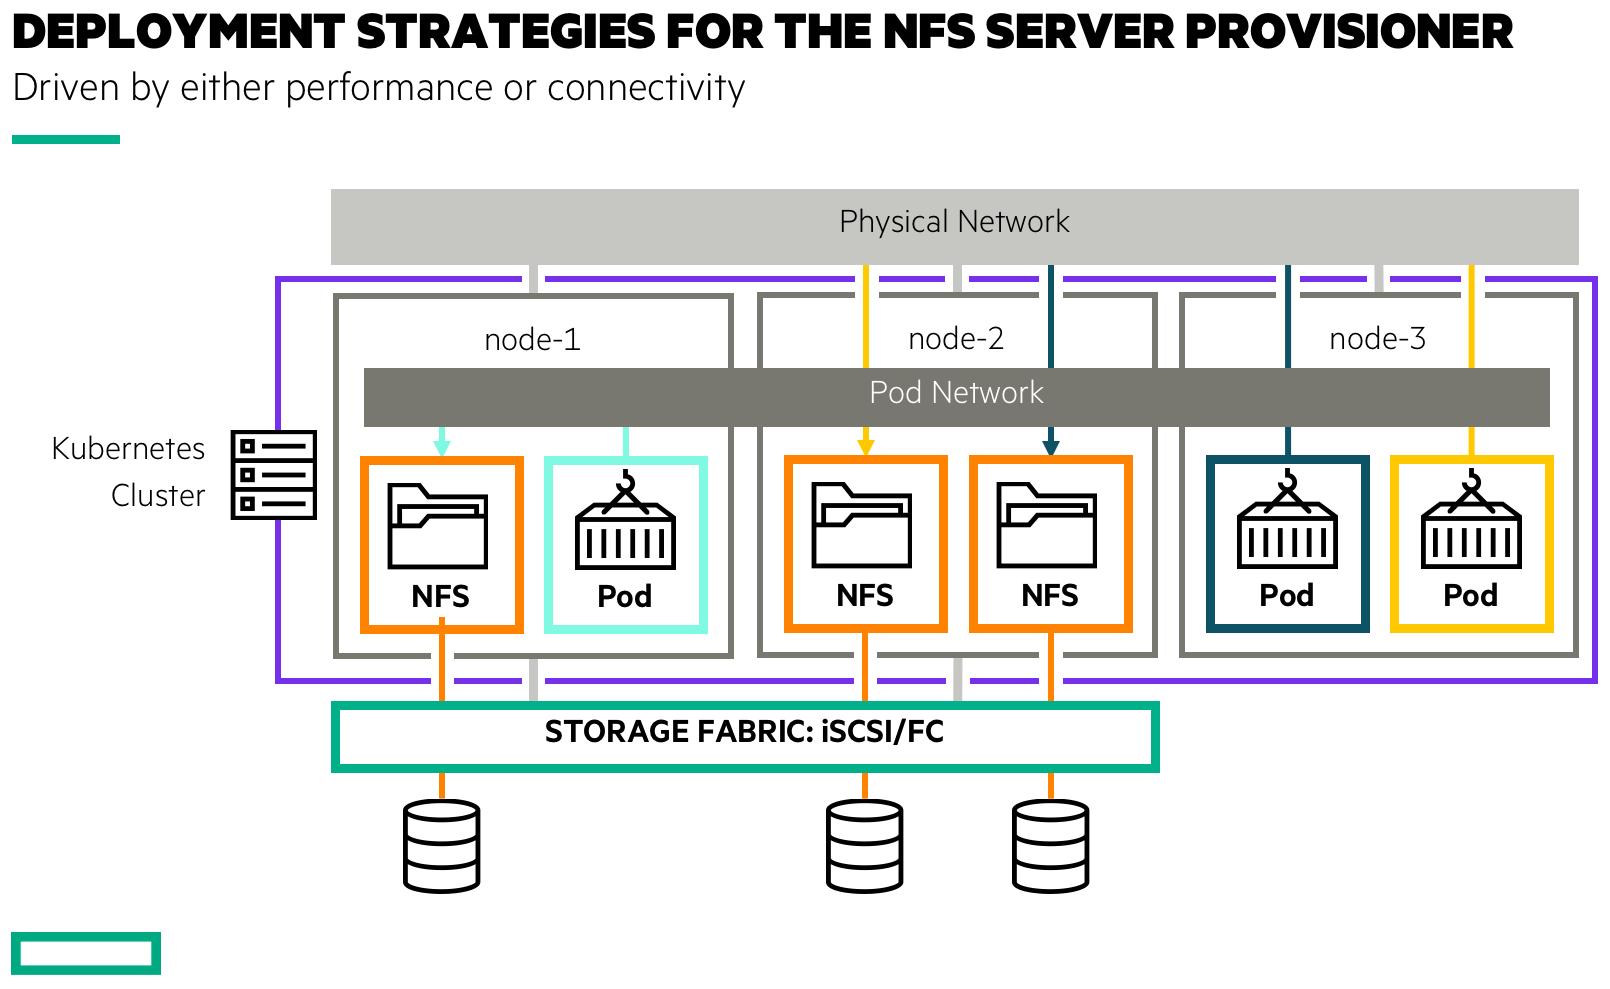 NFS Server Provisioner Deployment Strategies